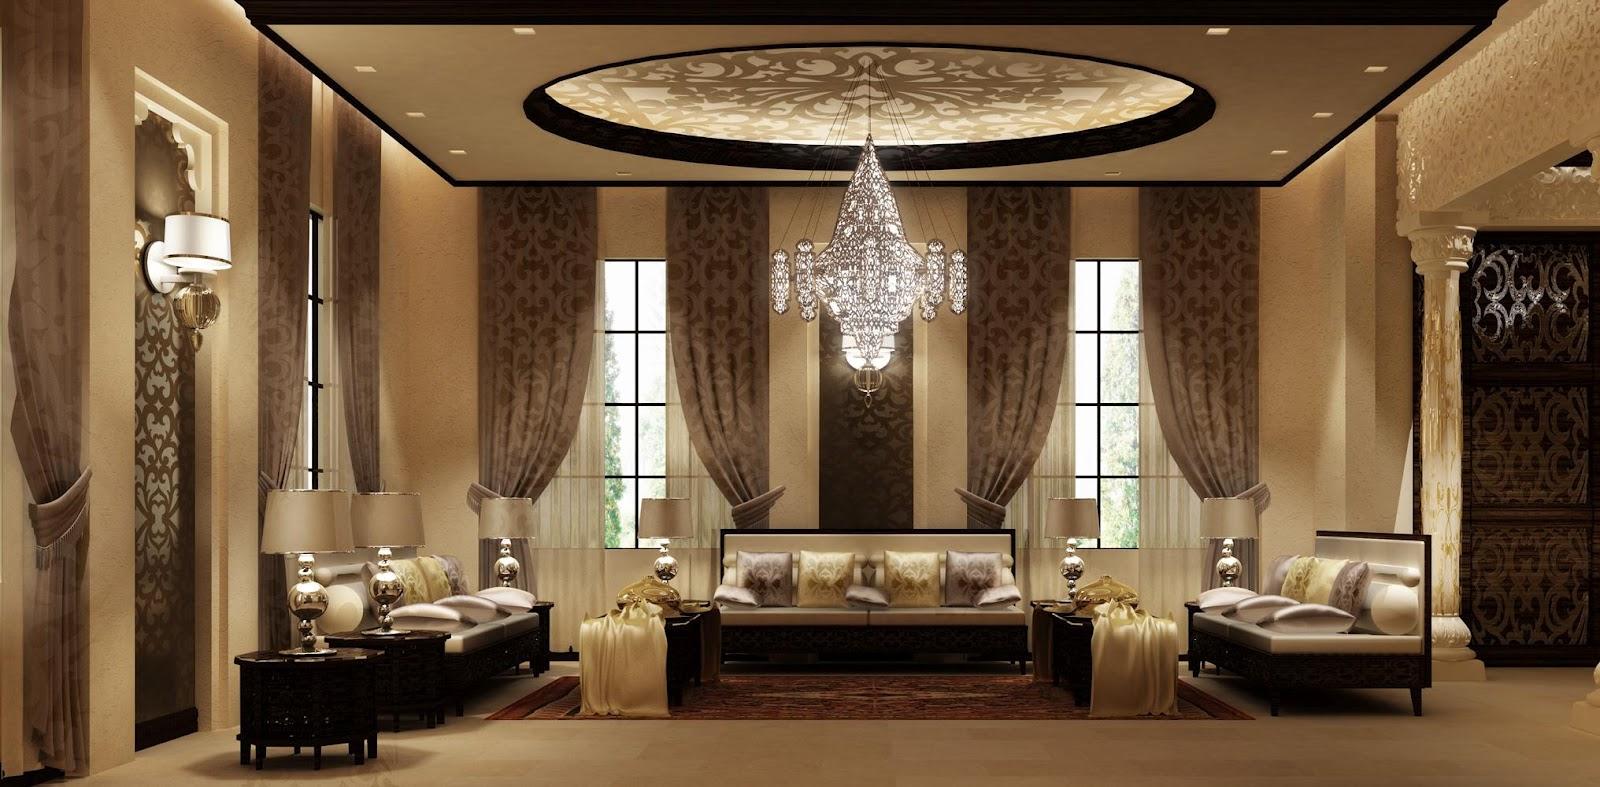 Front Elevation Marriage Hall : Casatreschic interior marriage banquet hall hotel front